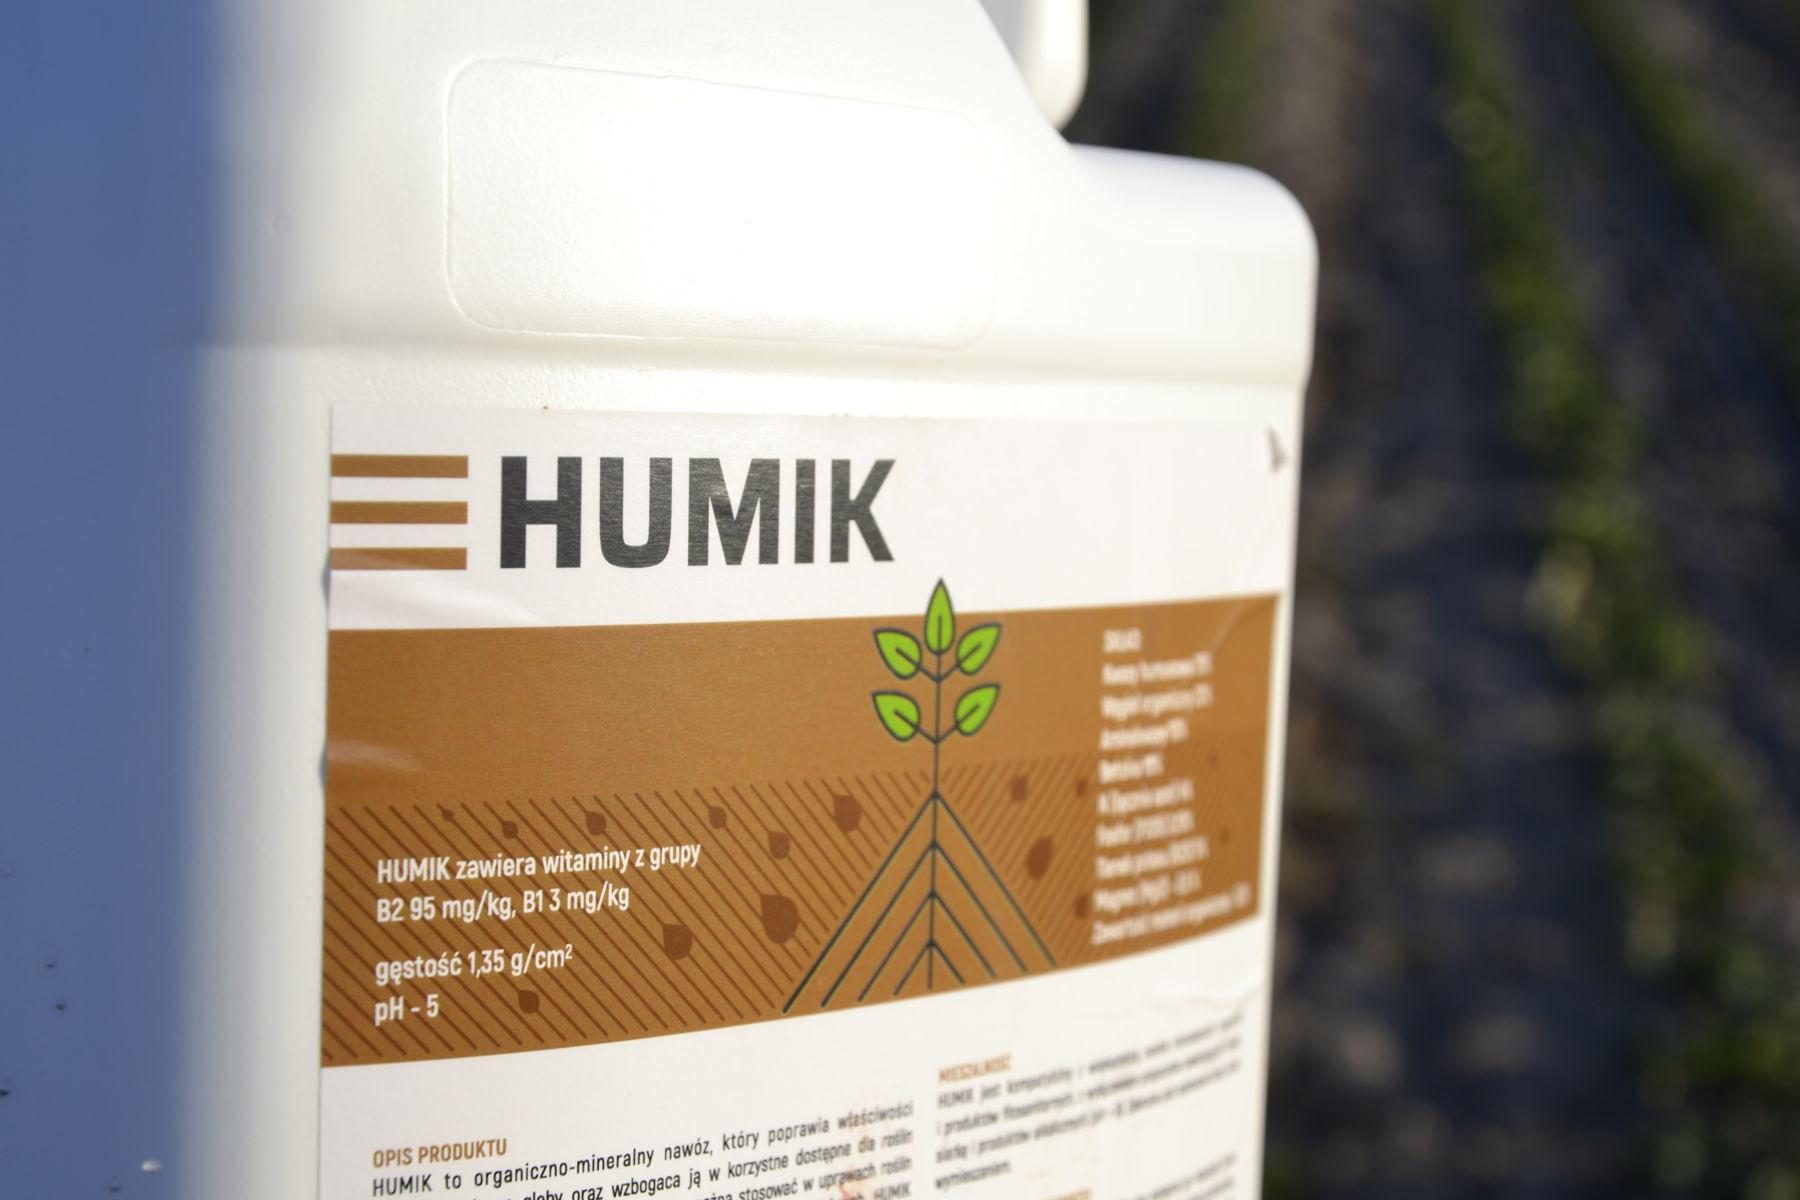 organiczno-mineralny-nawoz-humik-calfert